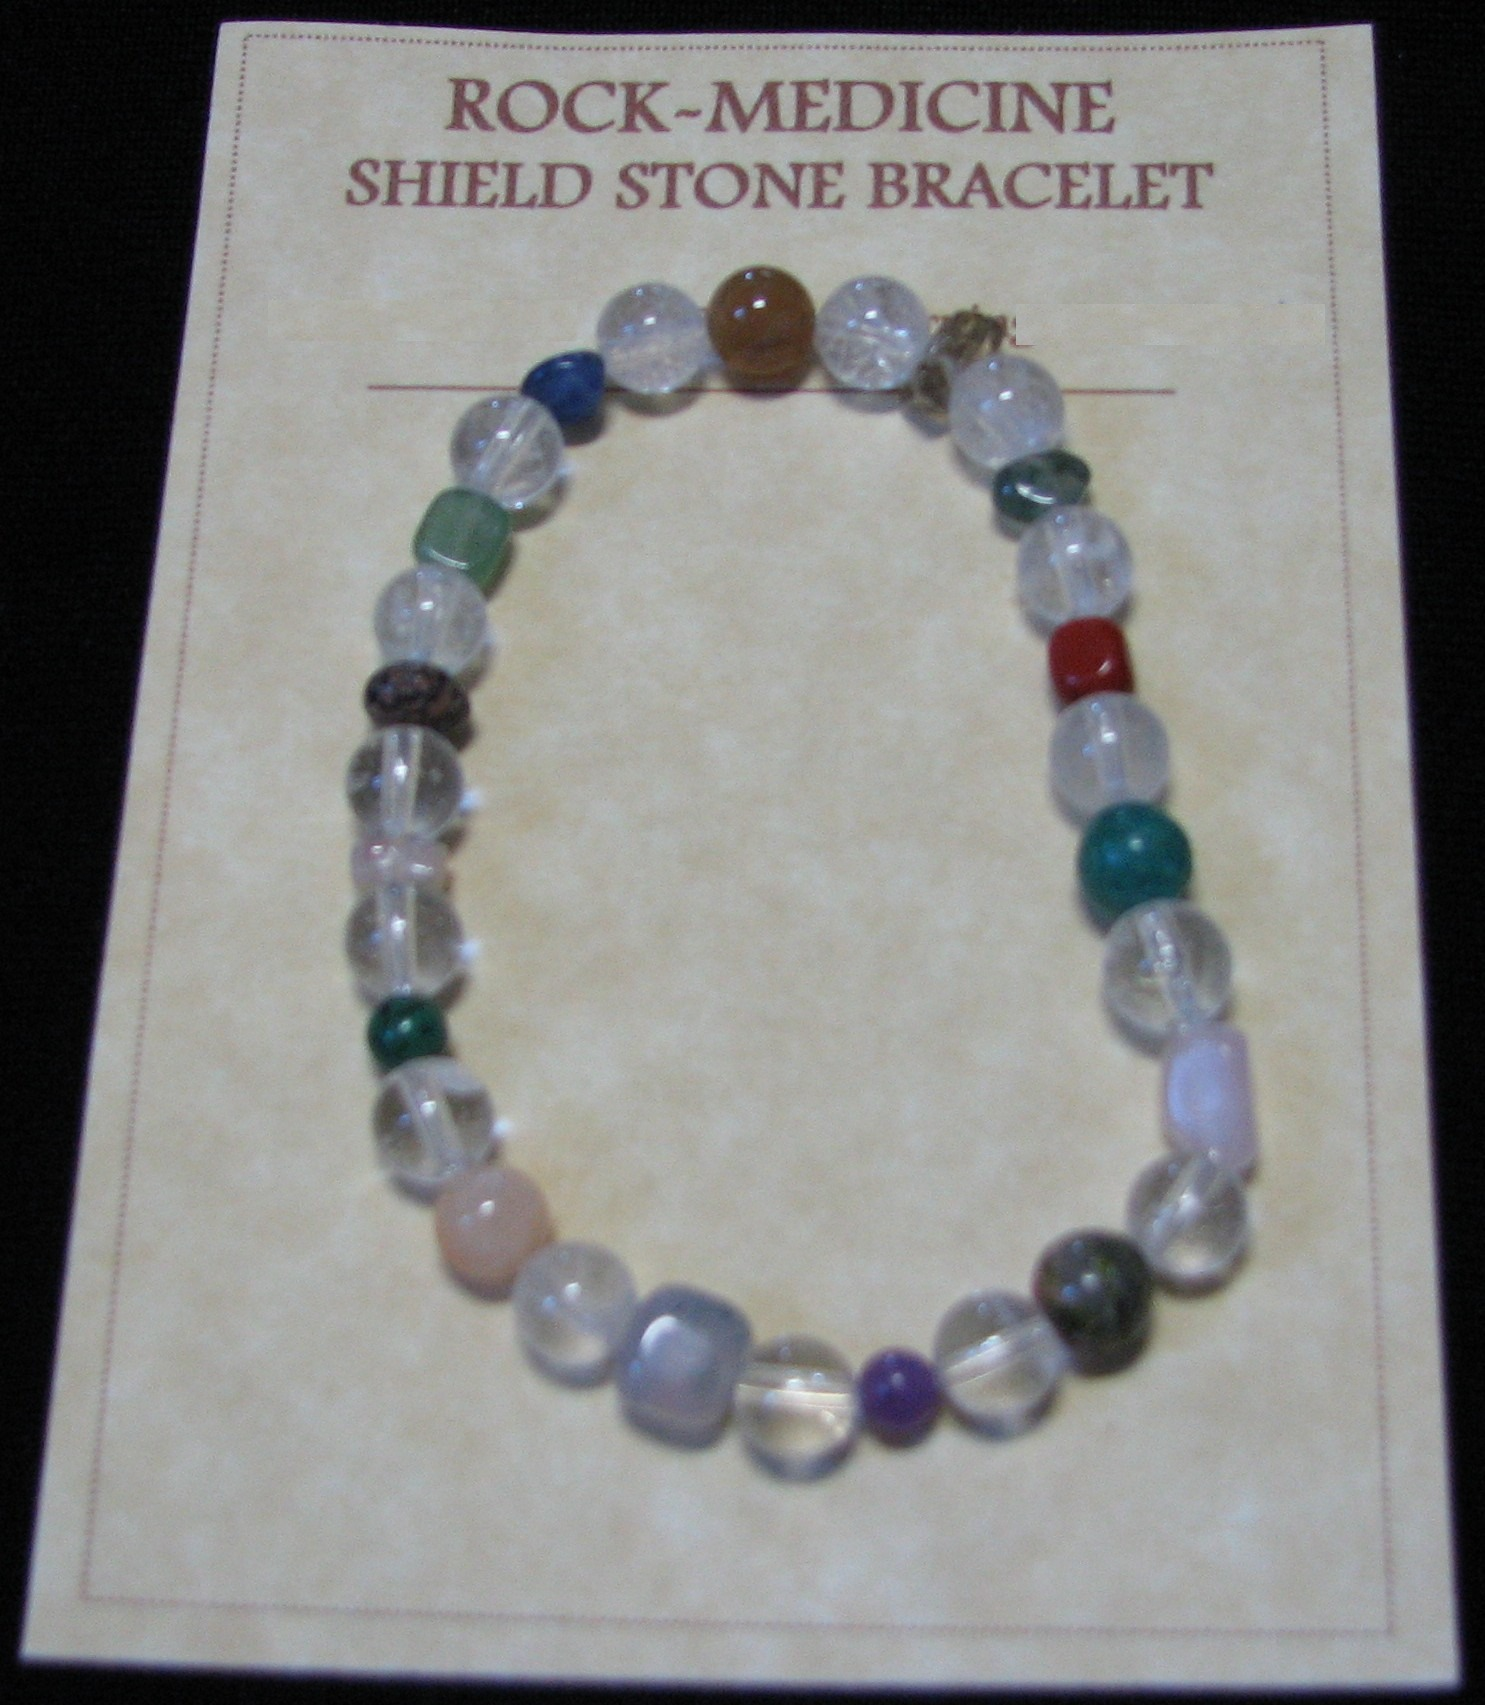 Shield Stone Bracelet